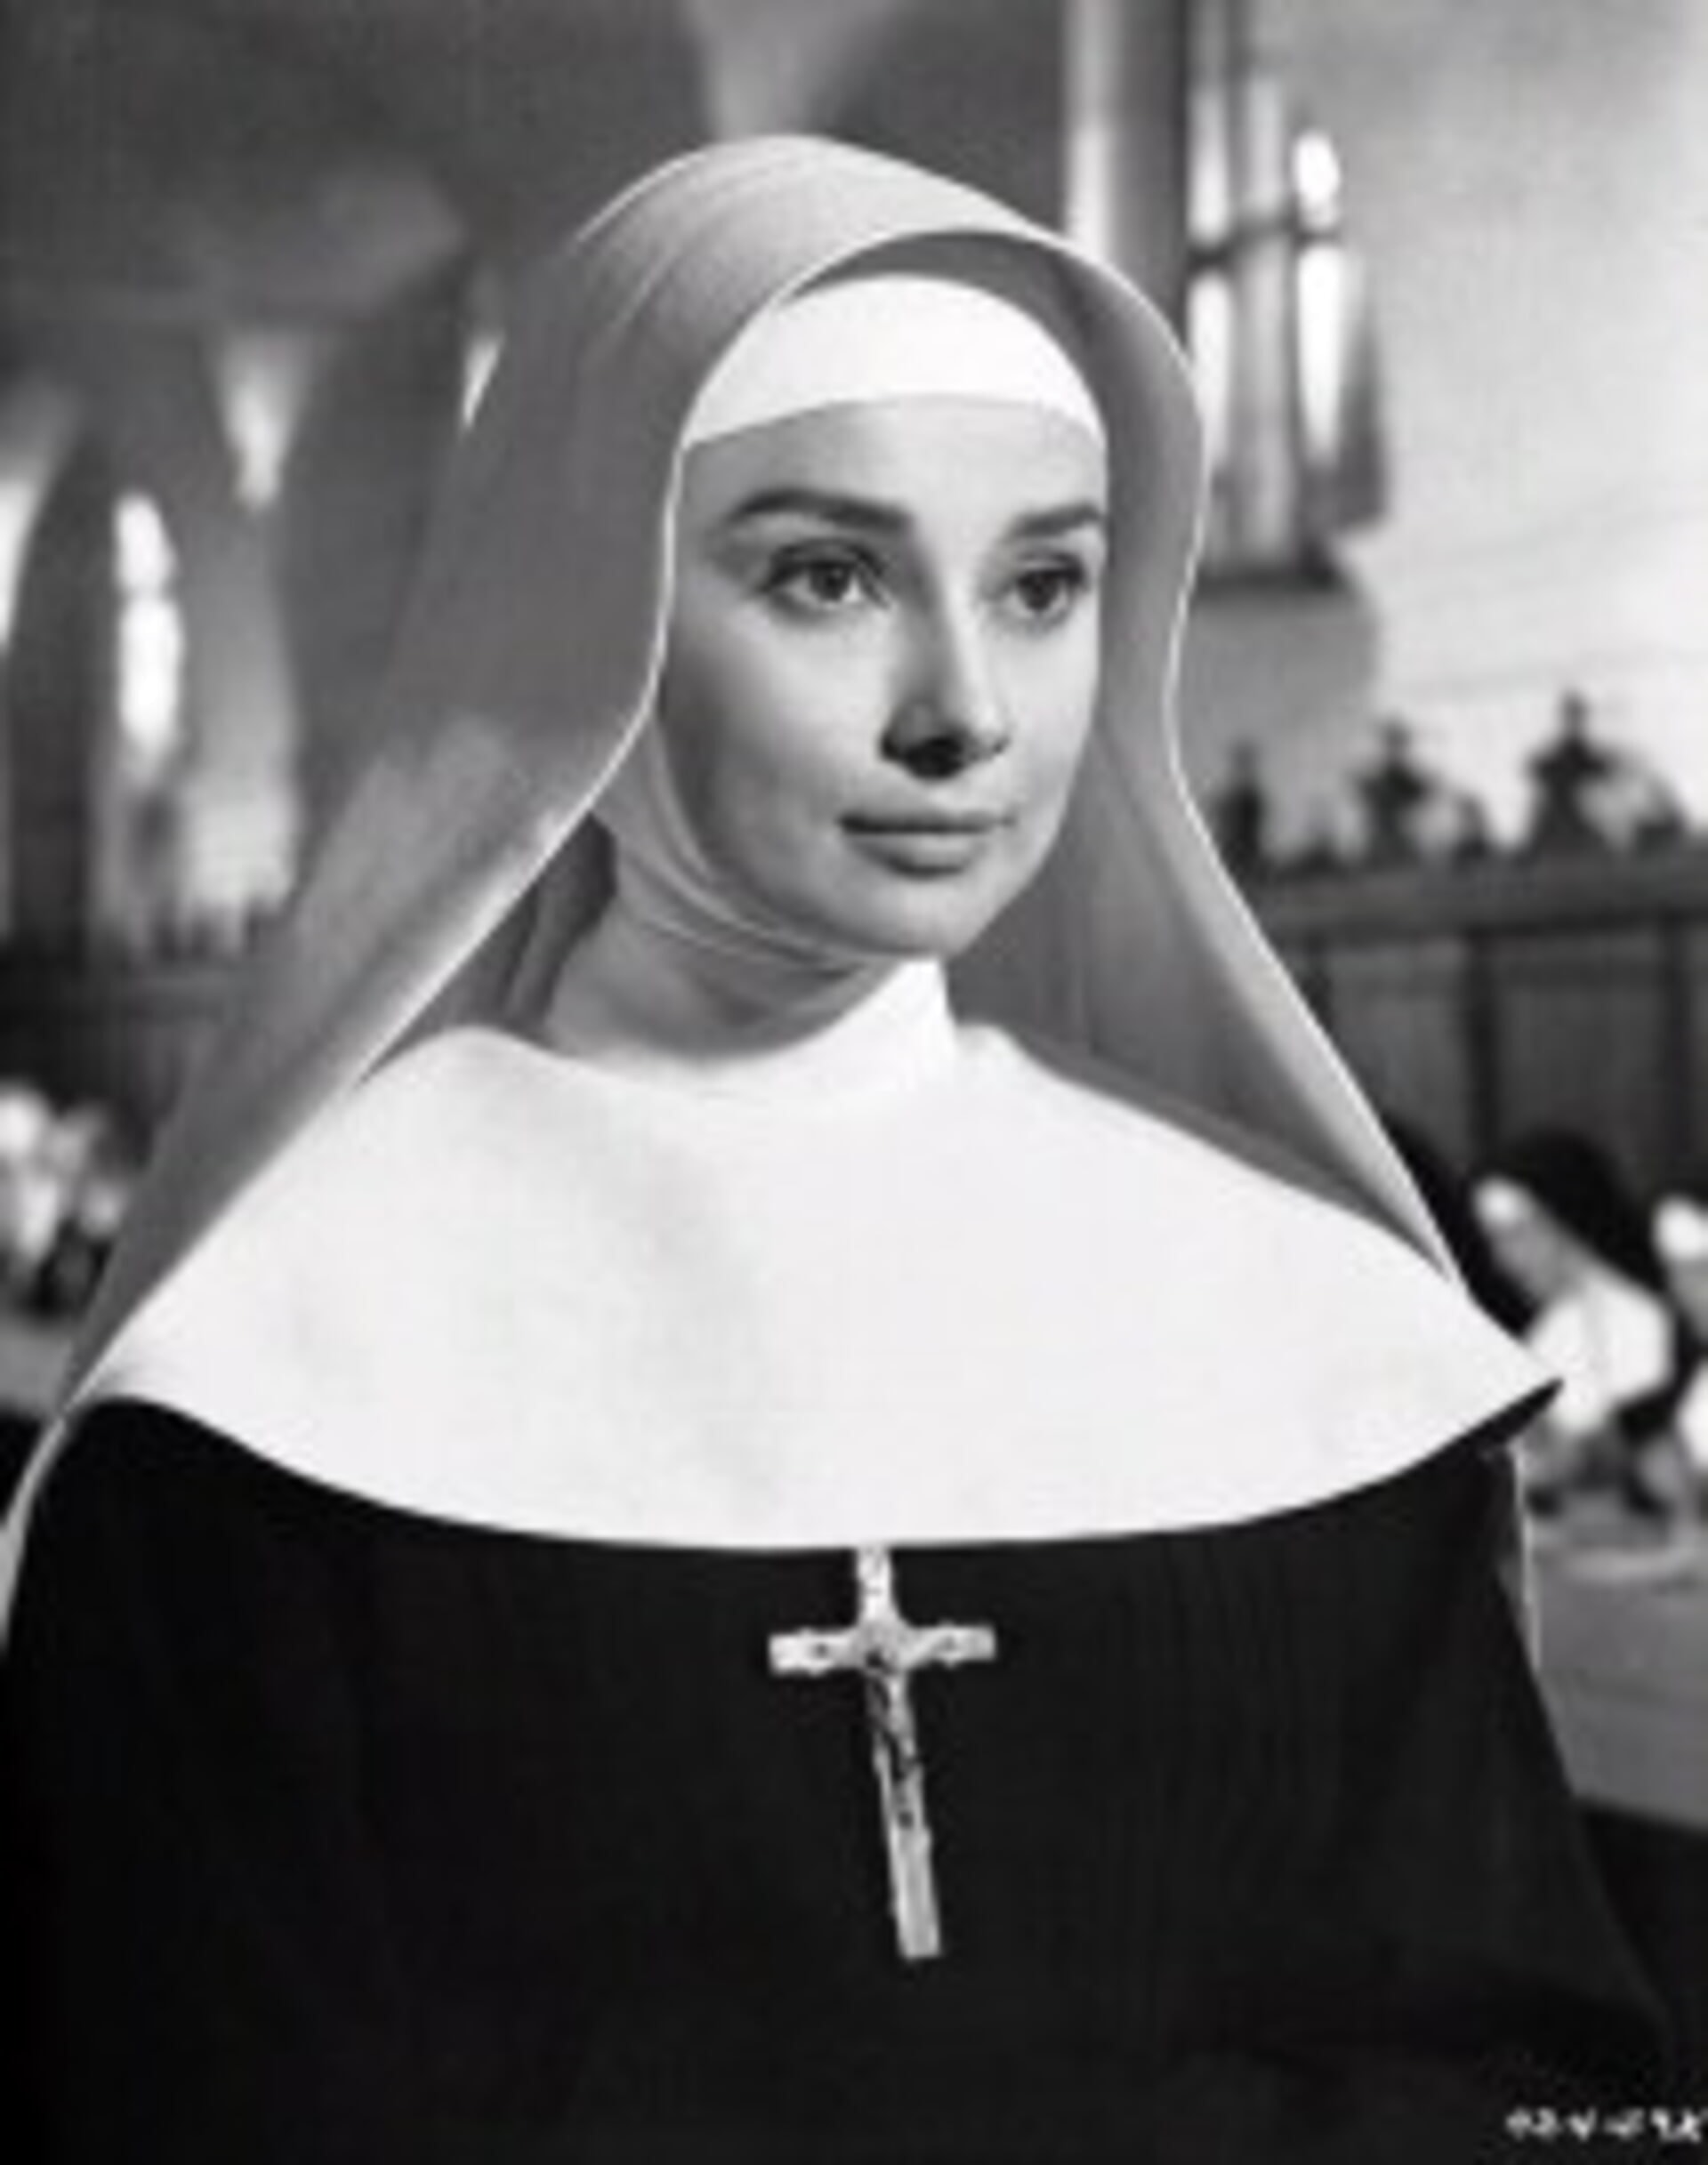 The Nun's Story - Image 3